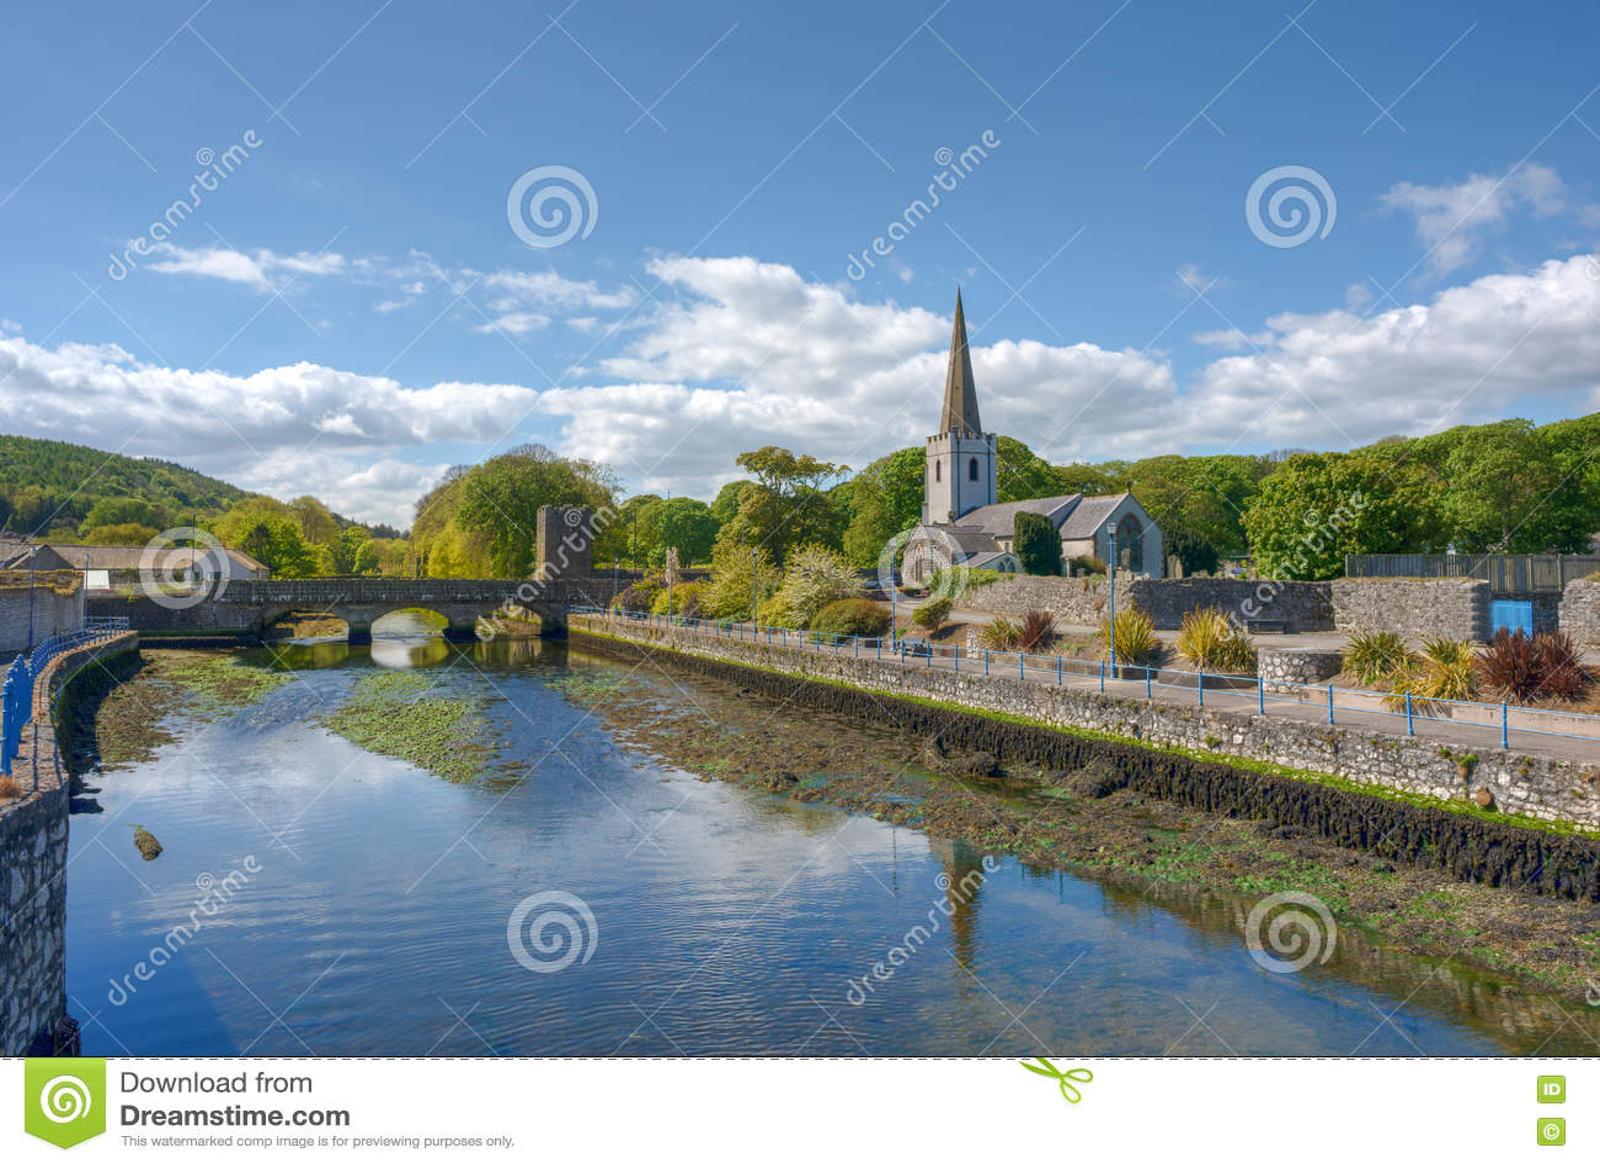 Northern ireland dating Northern Ireland